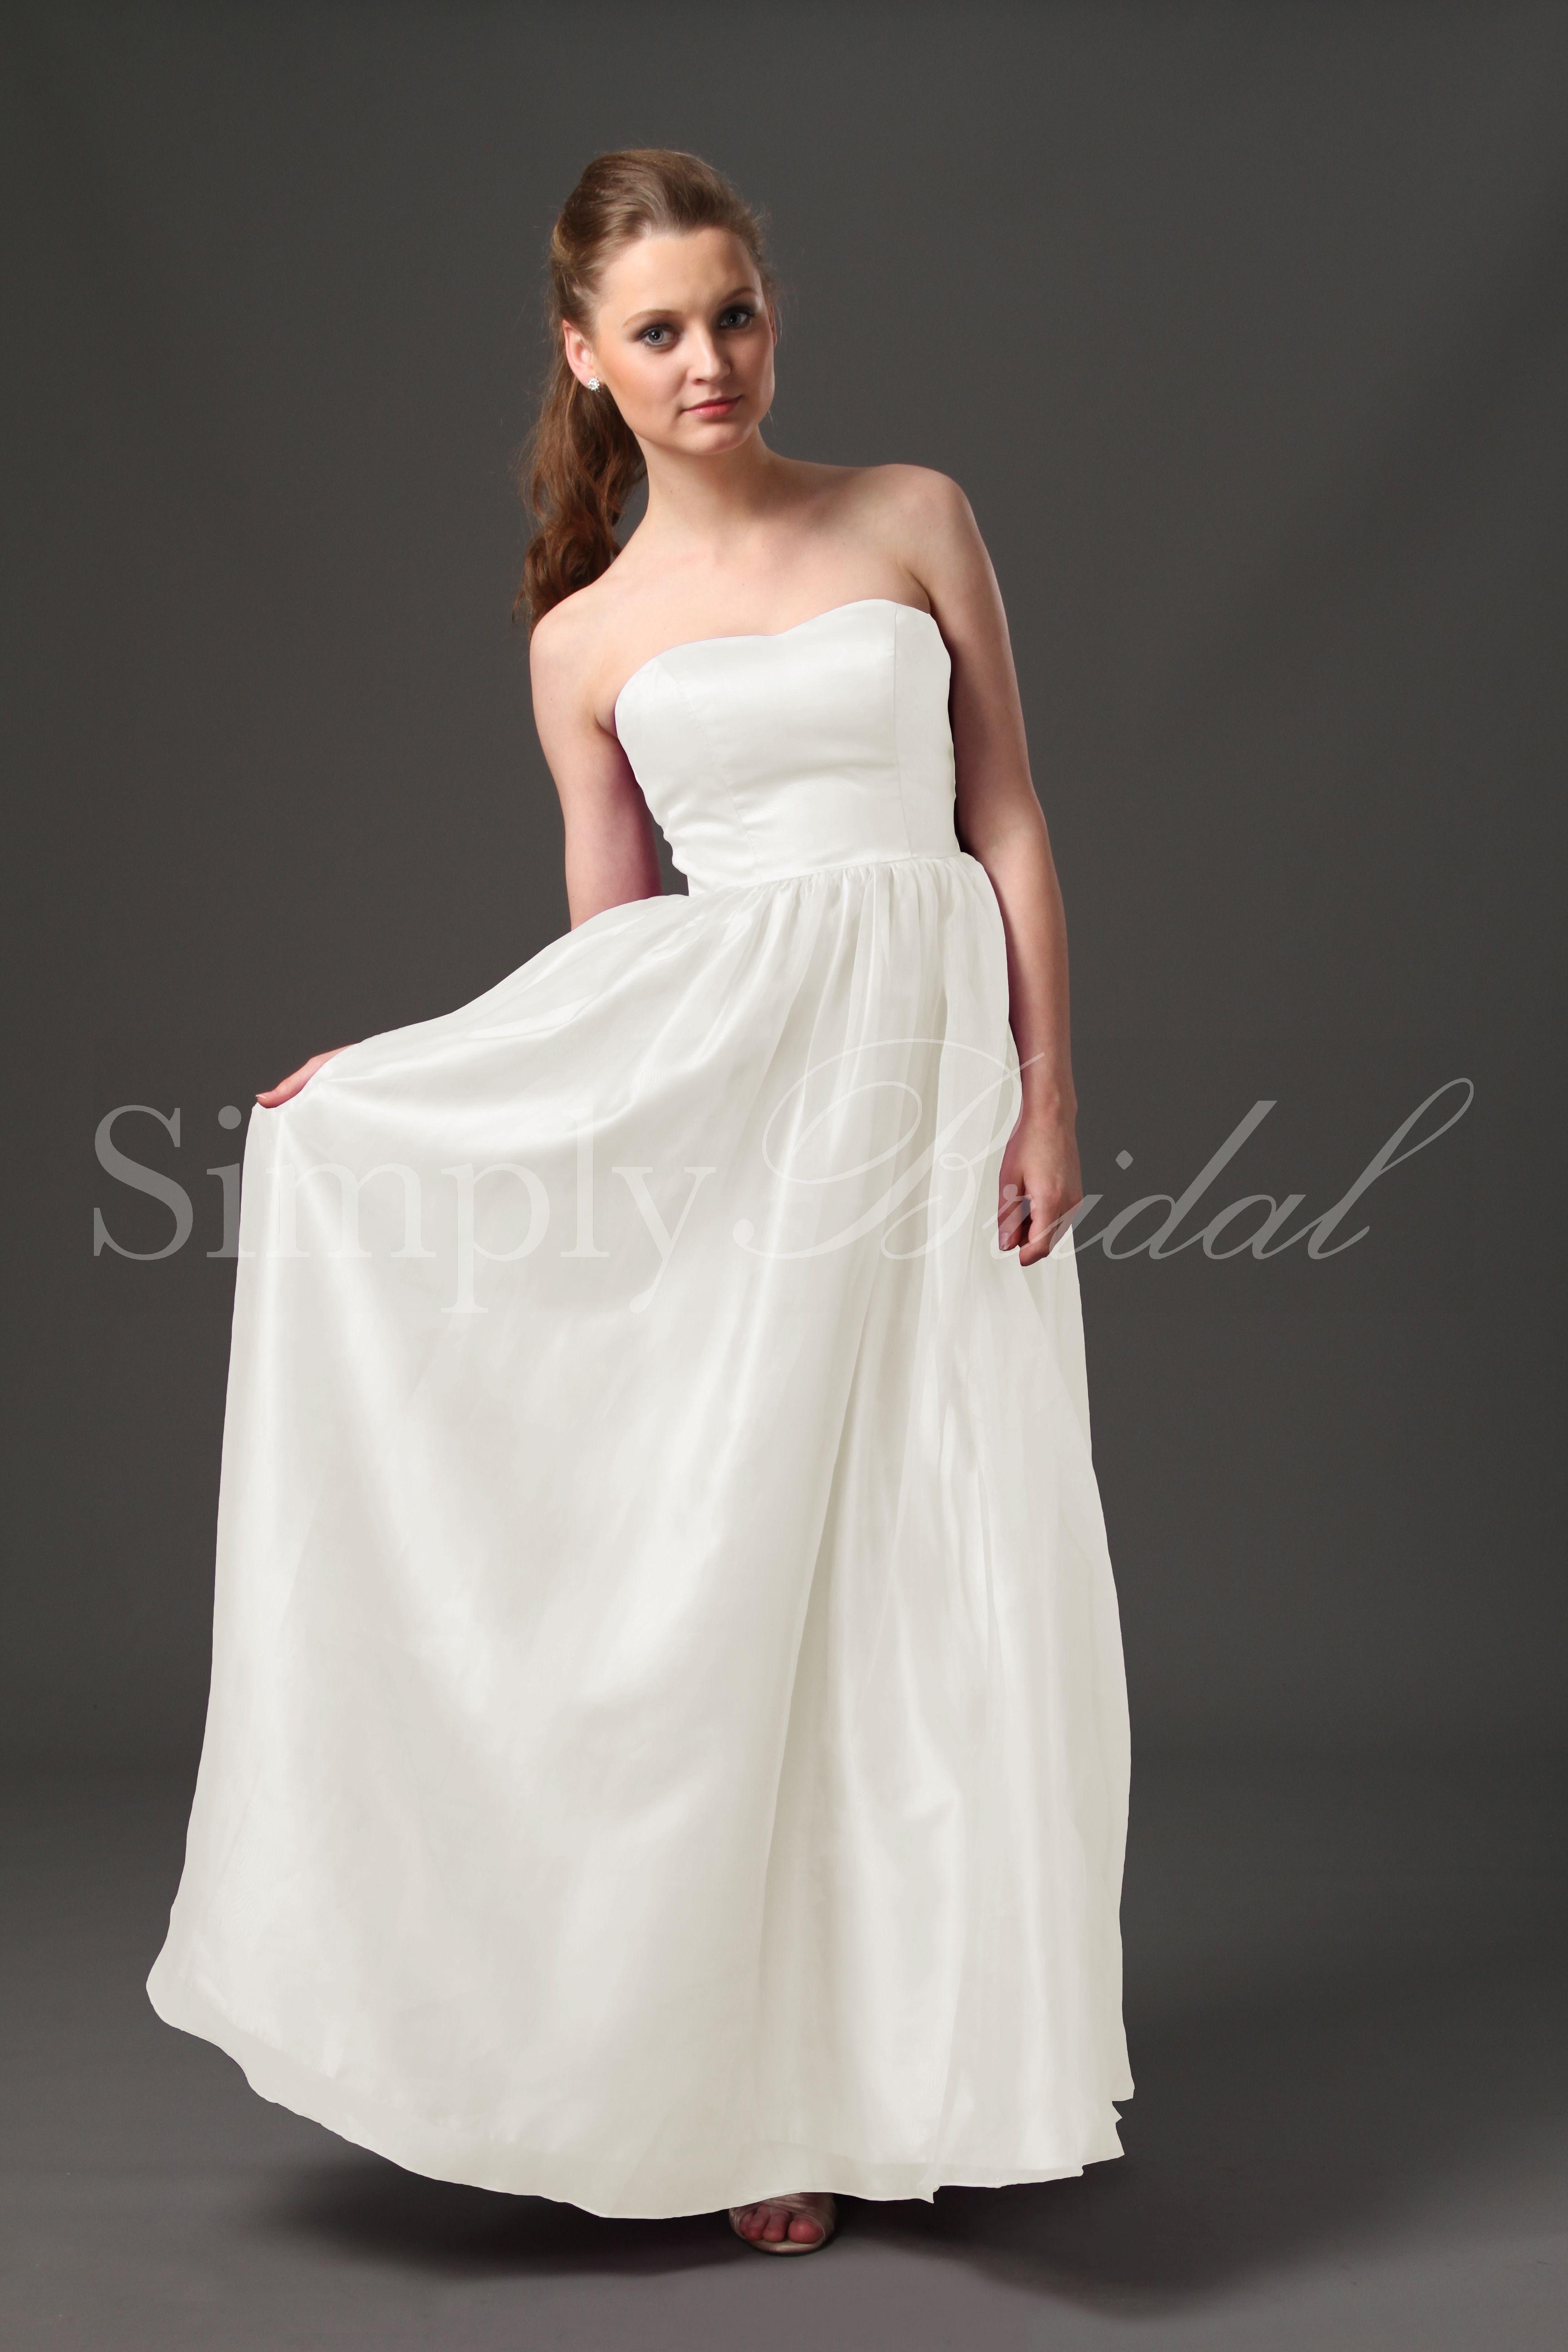 Handmade wedding dress  Empire with wide waistband Simply bridal Jolene gown  organza